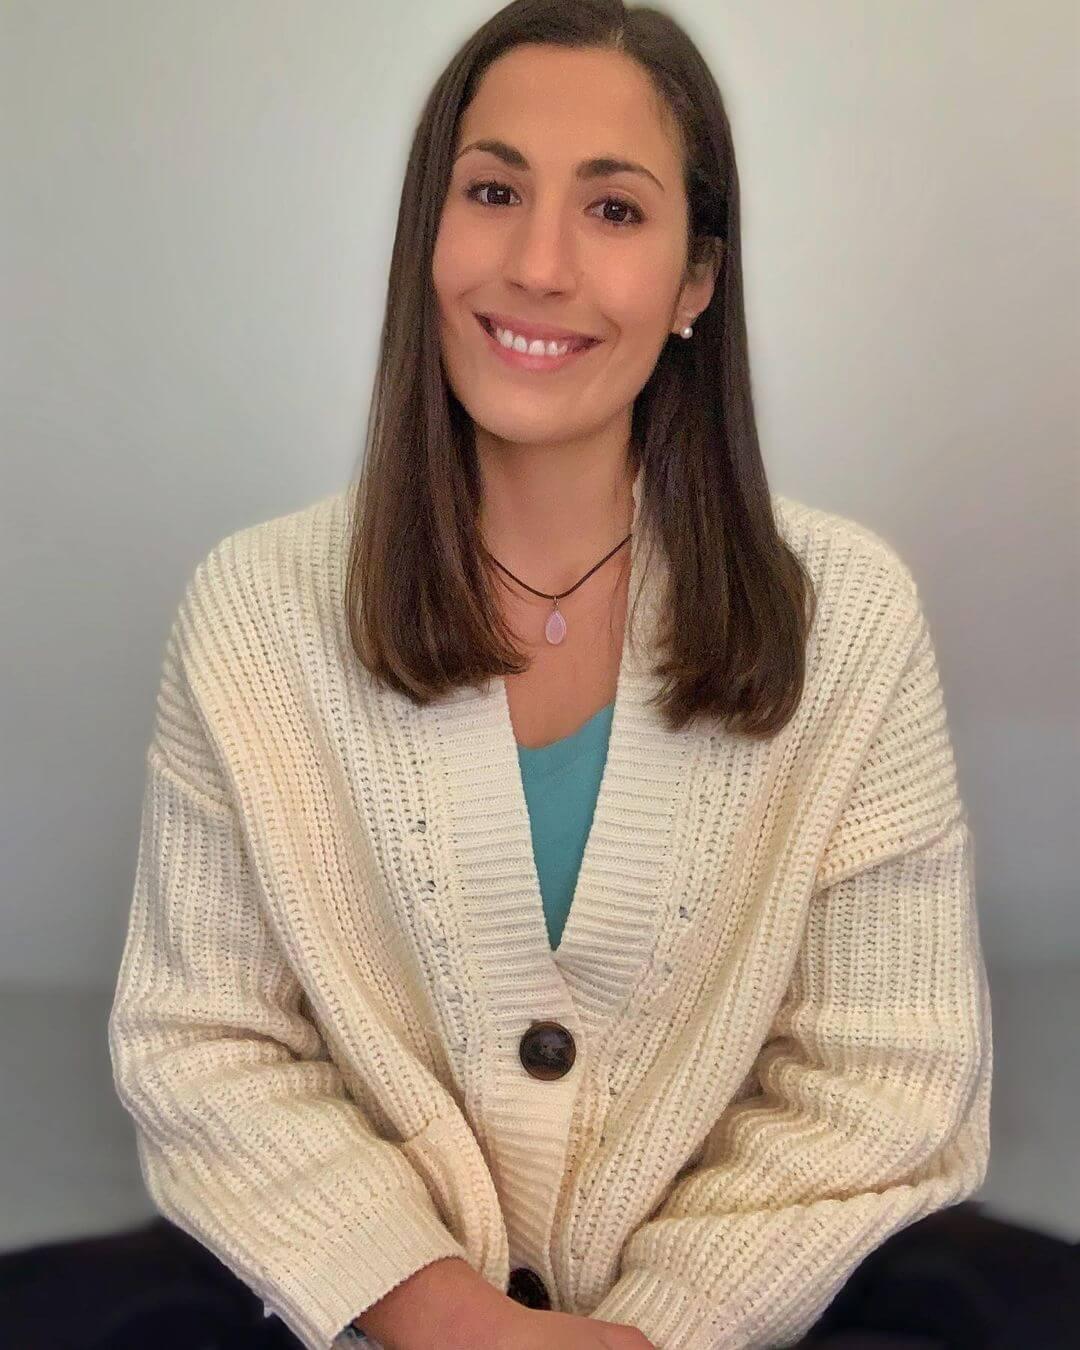 Lore Díaz Presentación